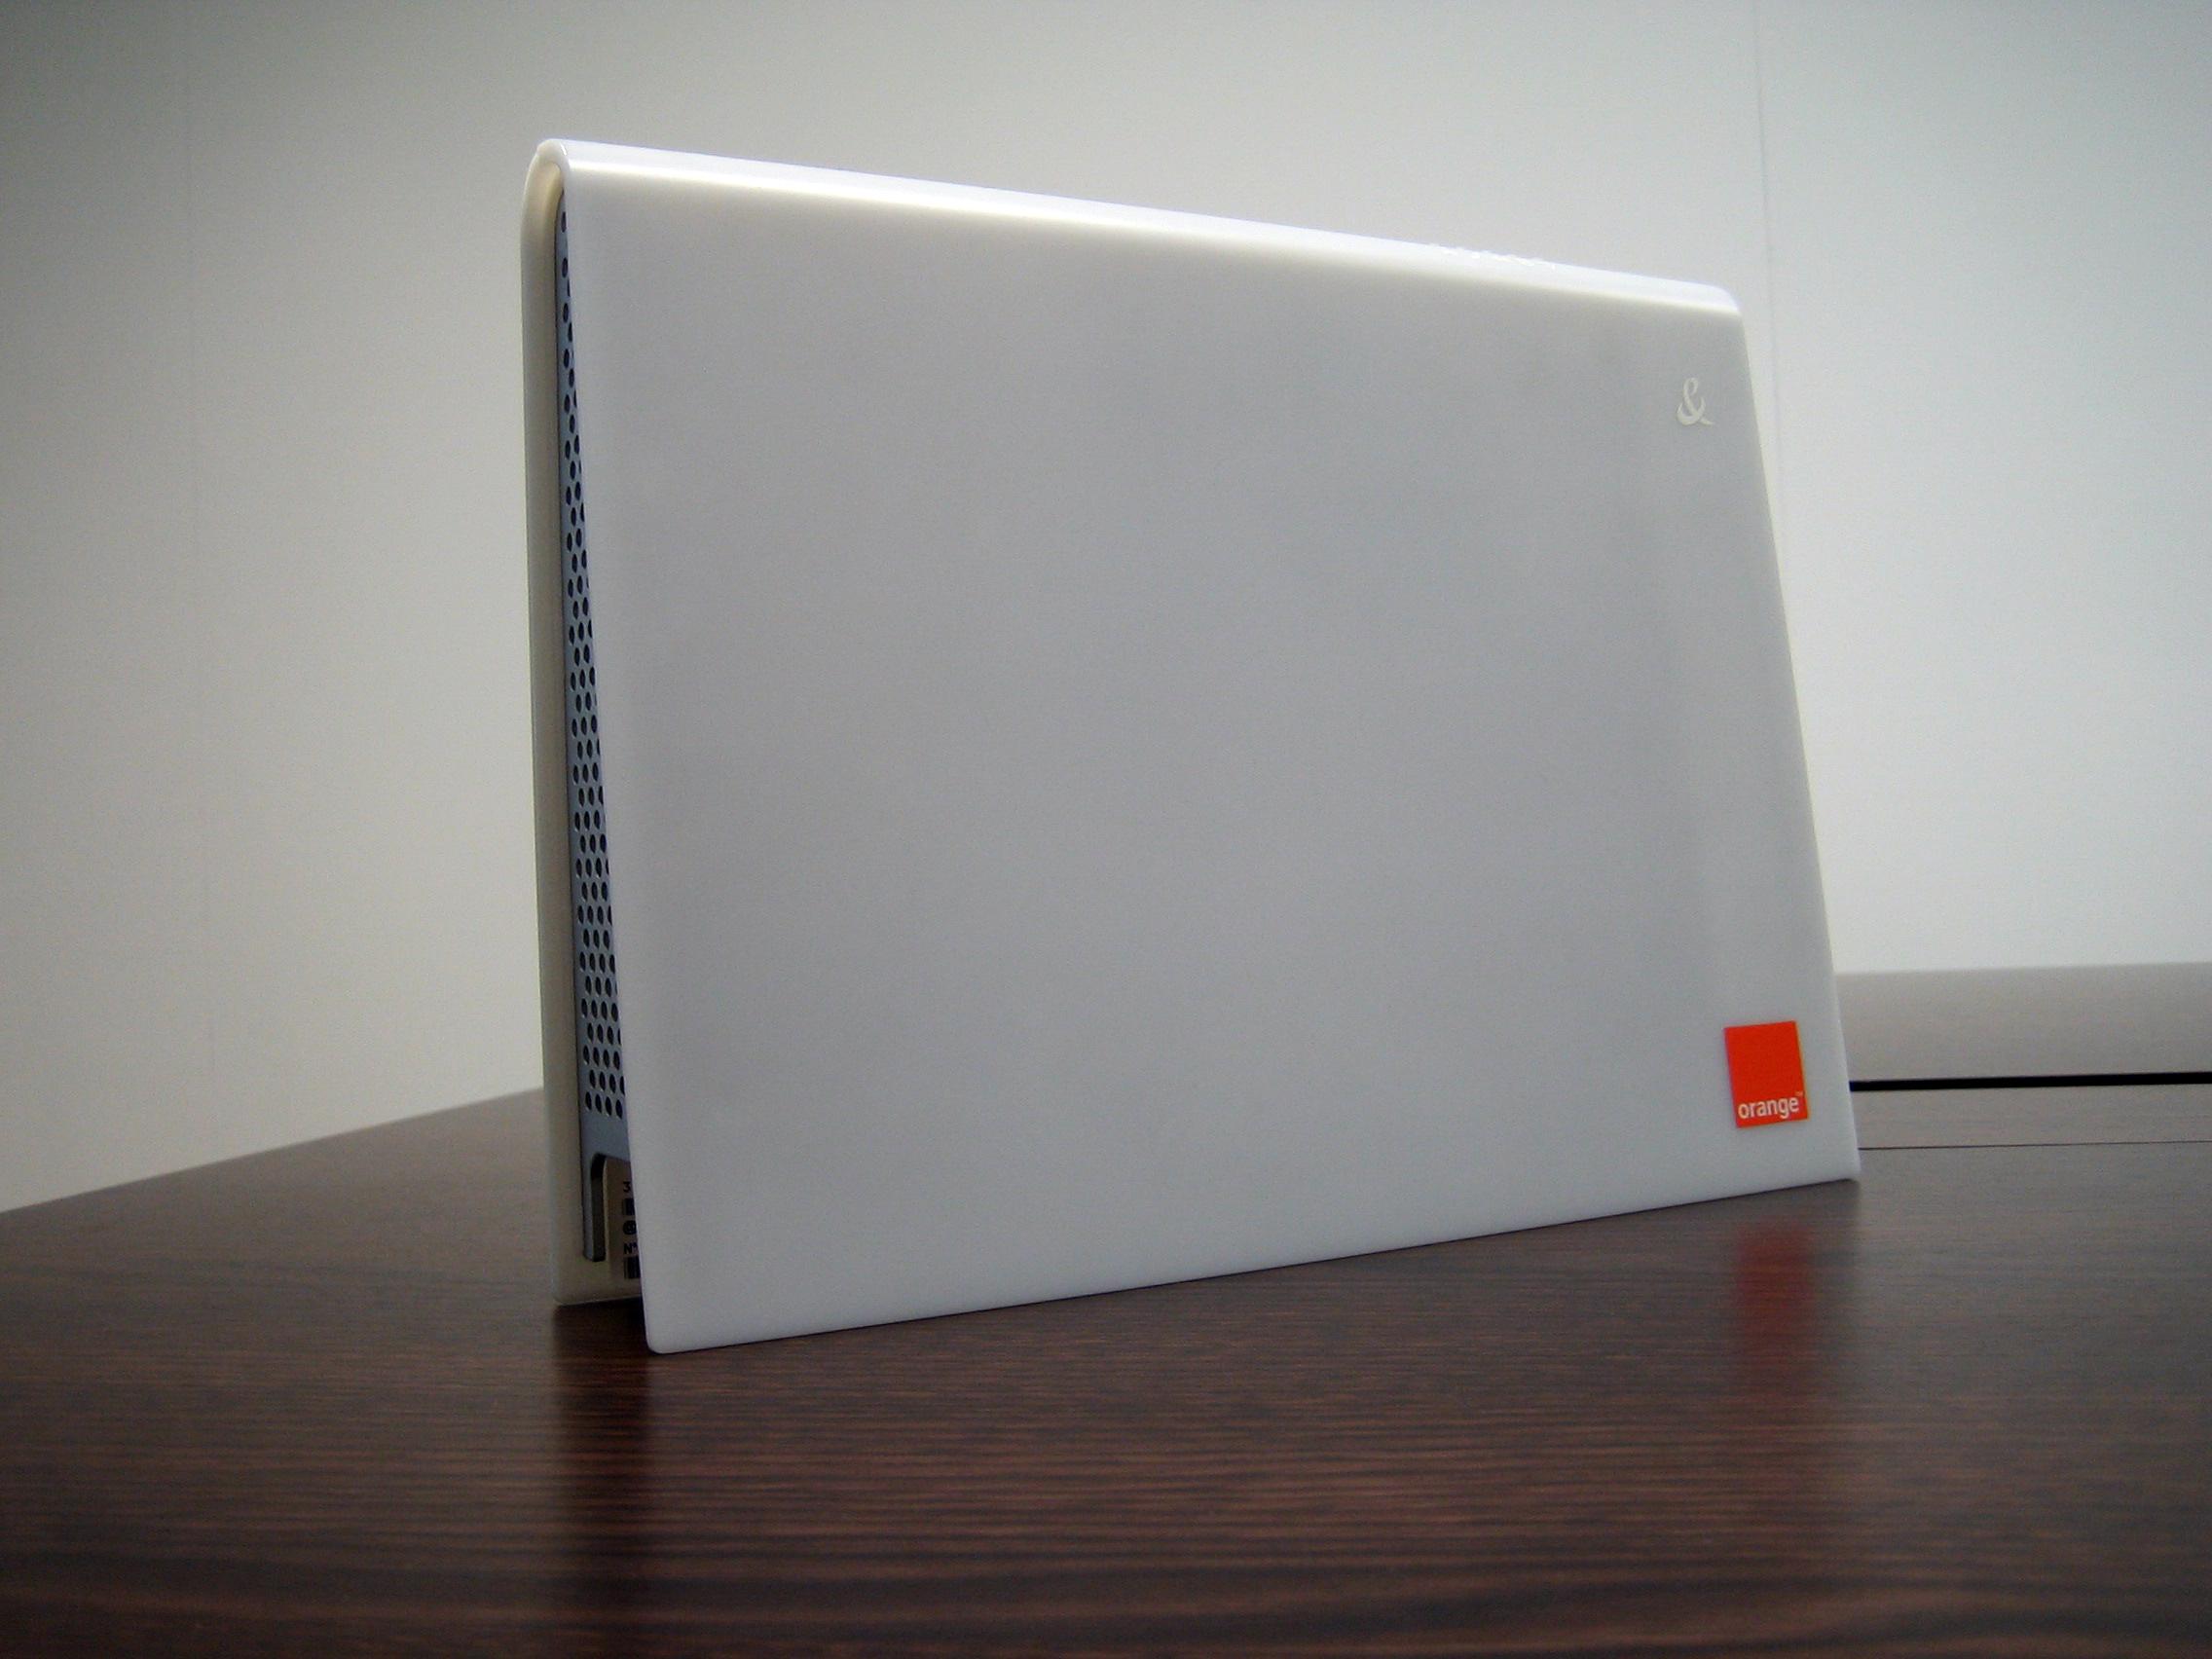 probl me pour connecter en wifi livebox r solu forum livebox. Black Bedroom Furniture Sets. Home Design Ideas